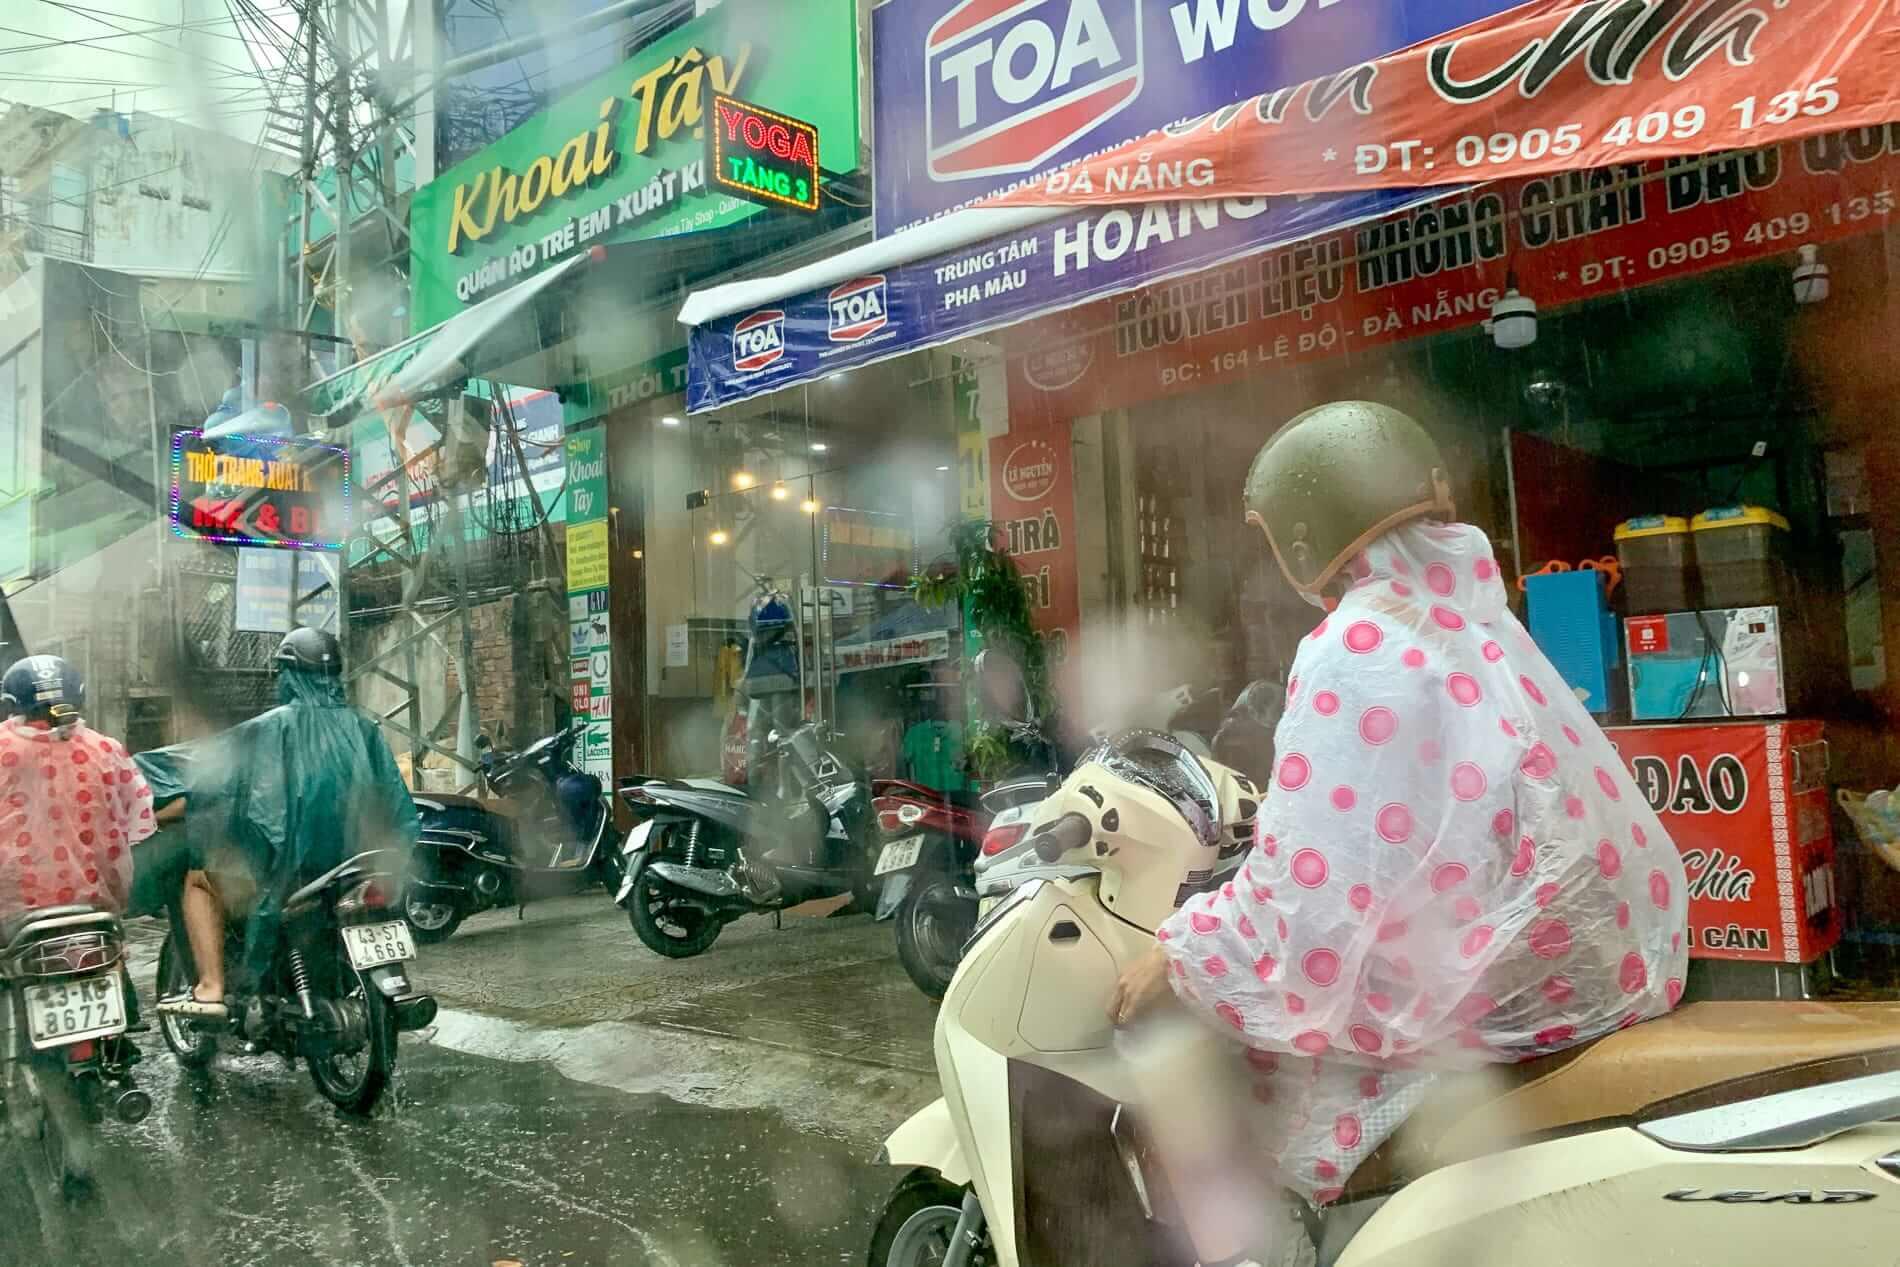 Motorbikes drive through the rain in Da Nang